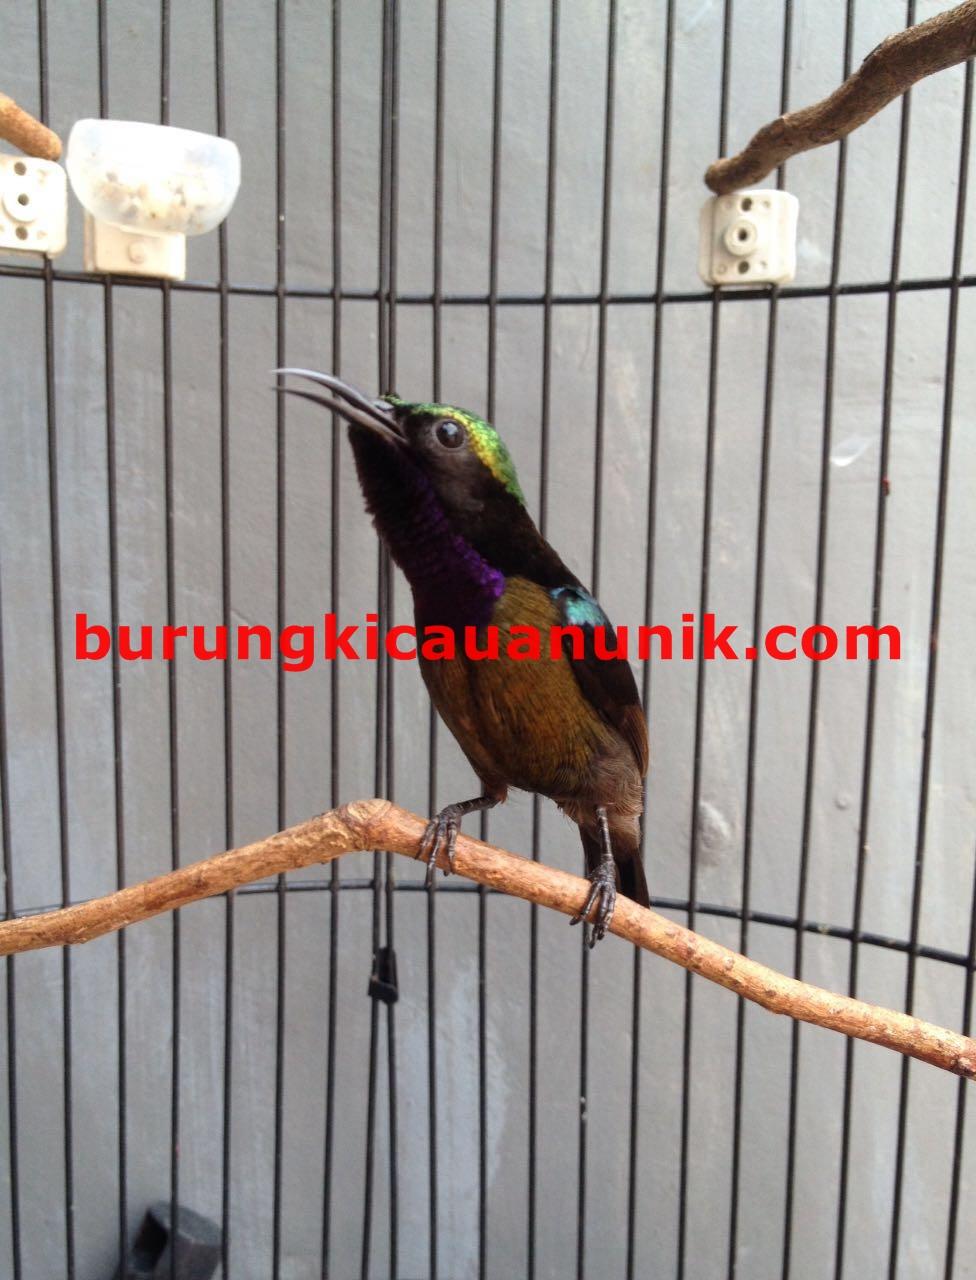 Download Video Kolibri Ninja : download, video, kolibri, ninja, Download, Suara, Burung, Kolibri, Ninja, Omkicau, Potentbydesign